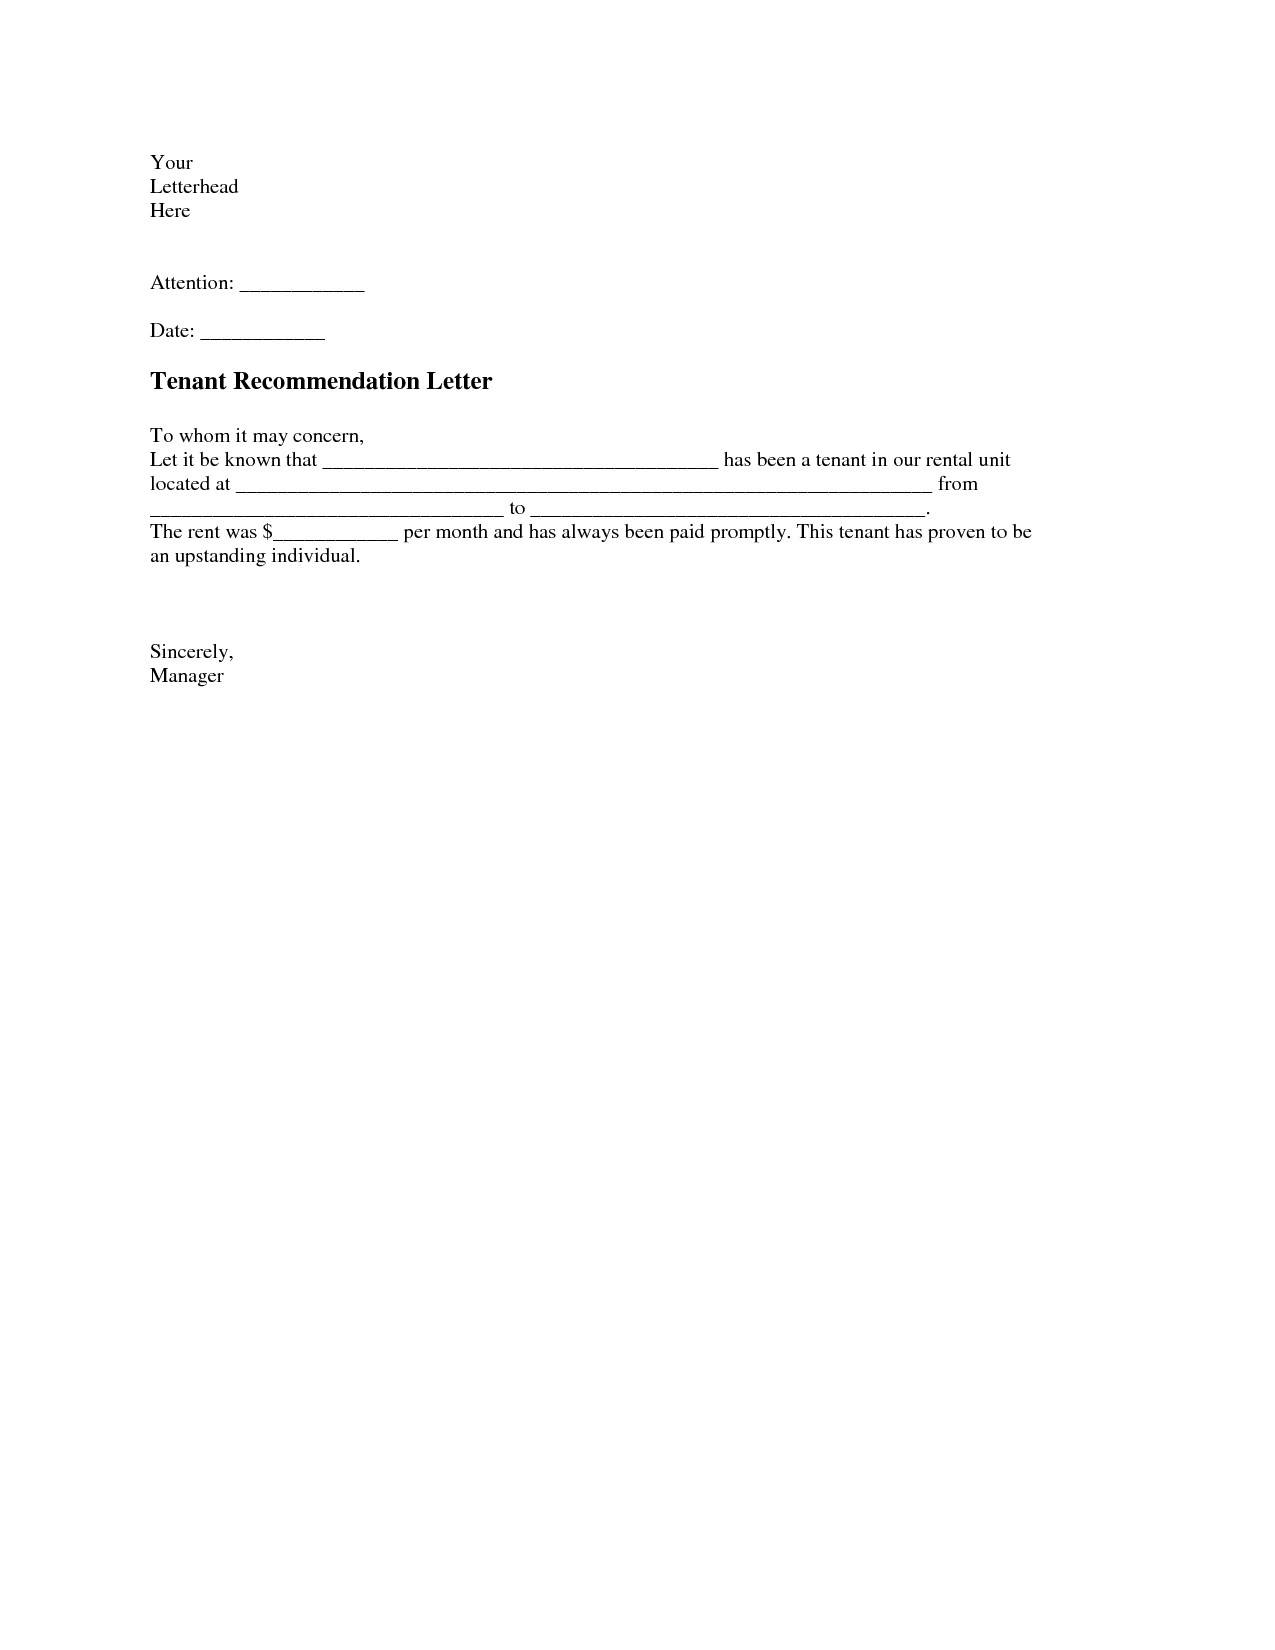 Sponsorship Letter Samples For Nonprofit Organizations